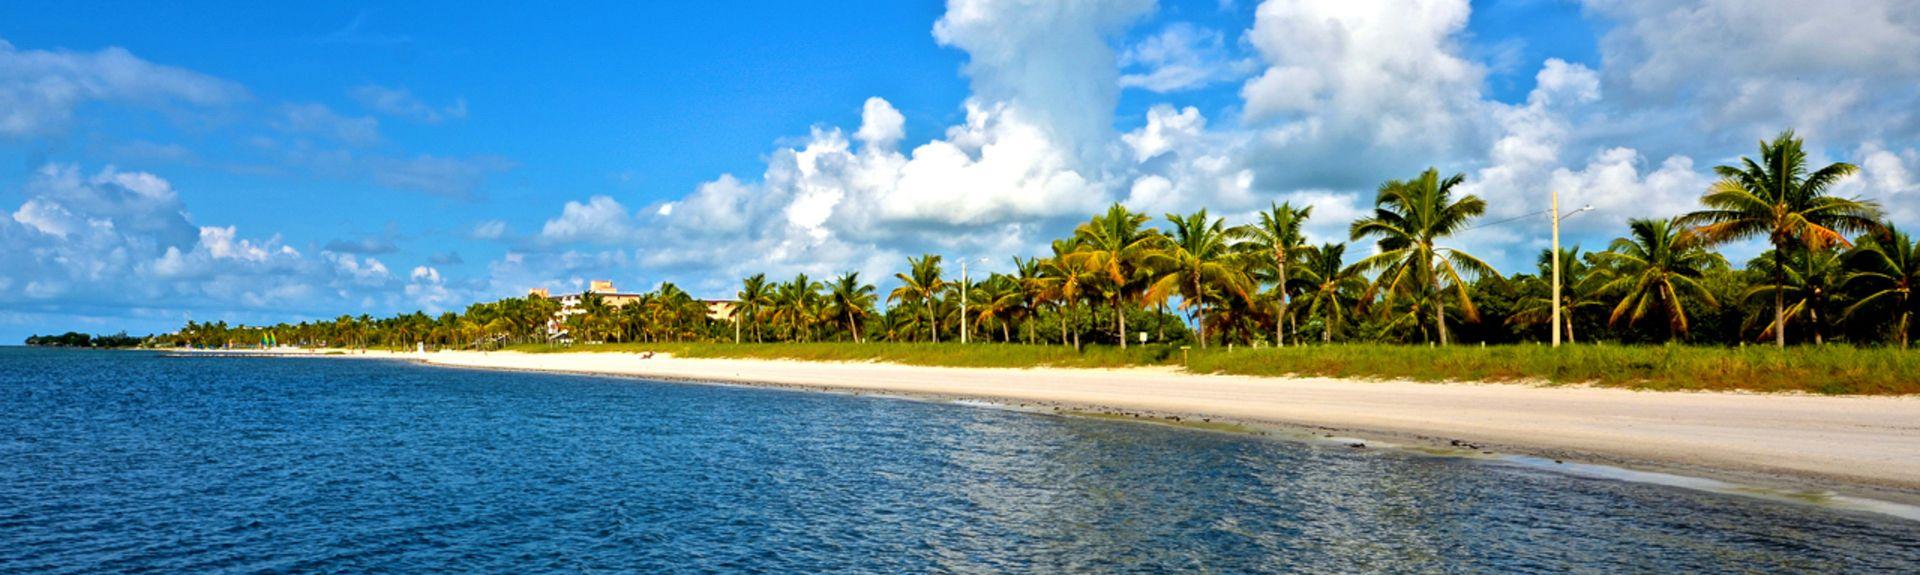 Fort Zachary Taylor Historic State Park, Key West, FL, USA